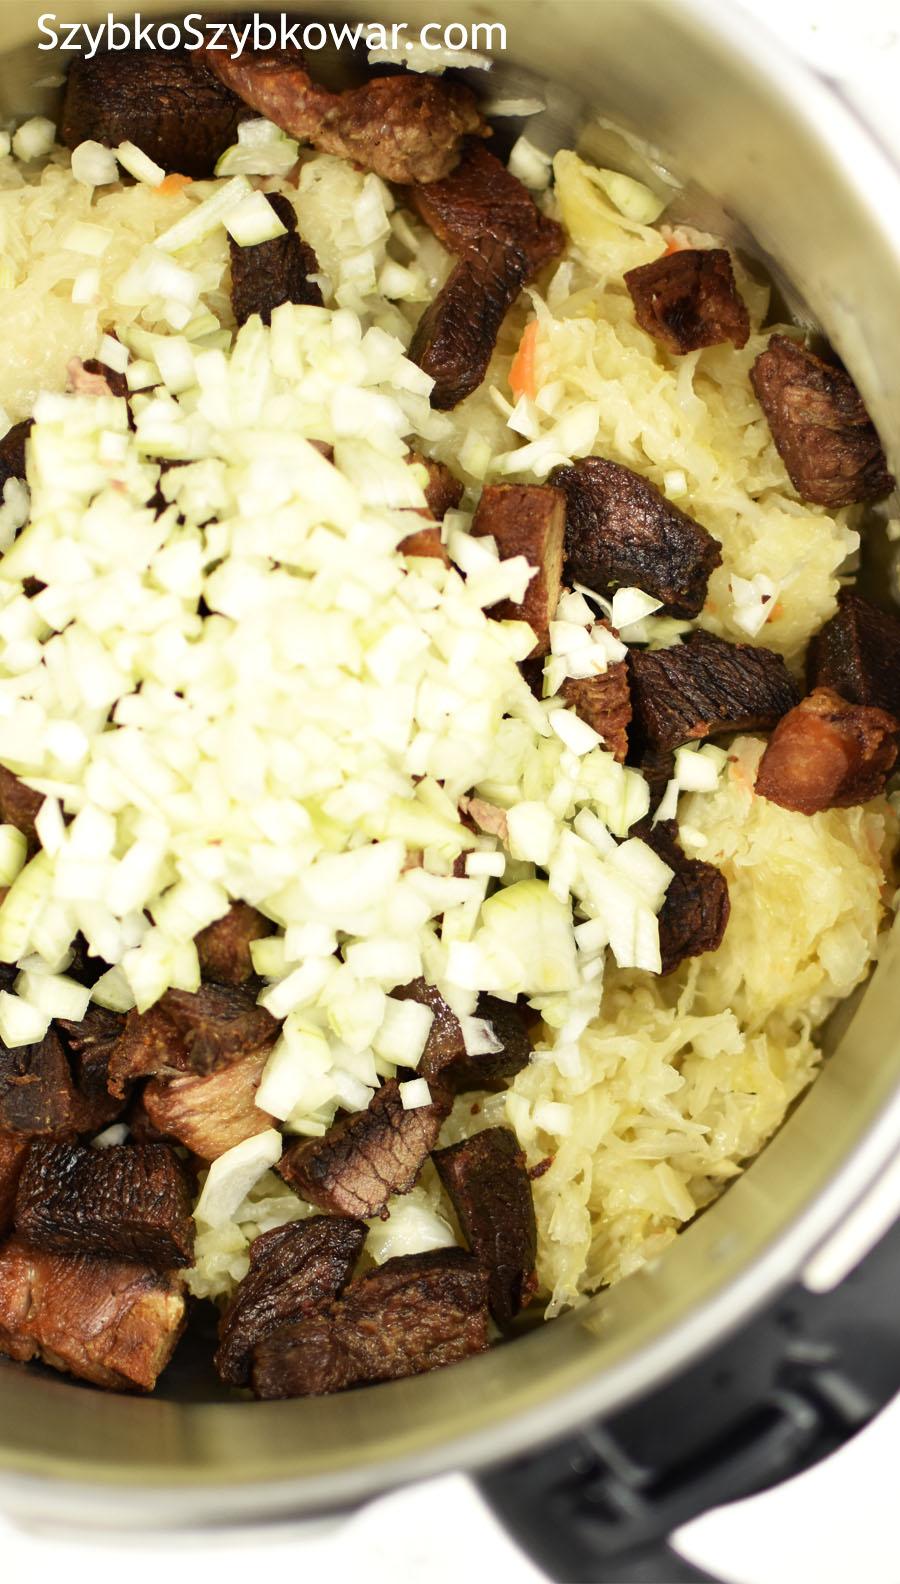 Dodane podsmażone mięso i cebulę...